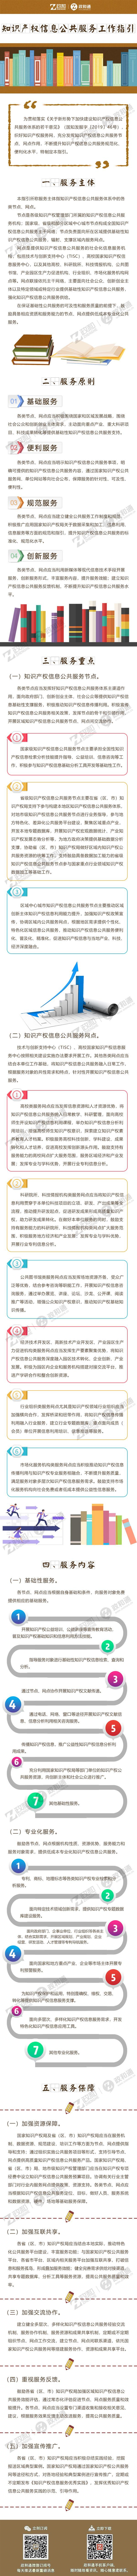 zh知识产权信息公共服务工作指引.jpg